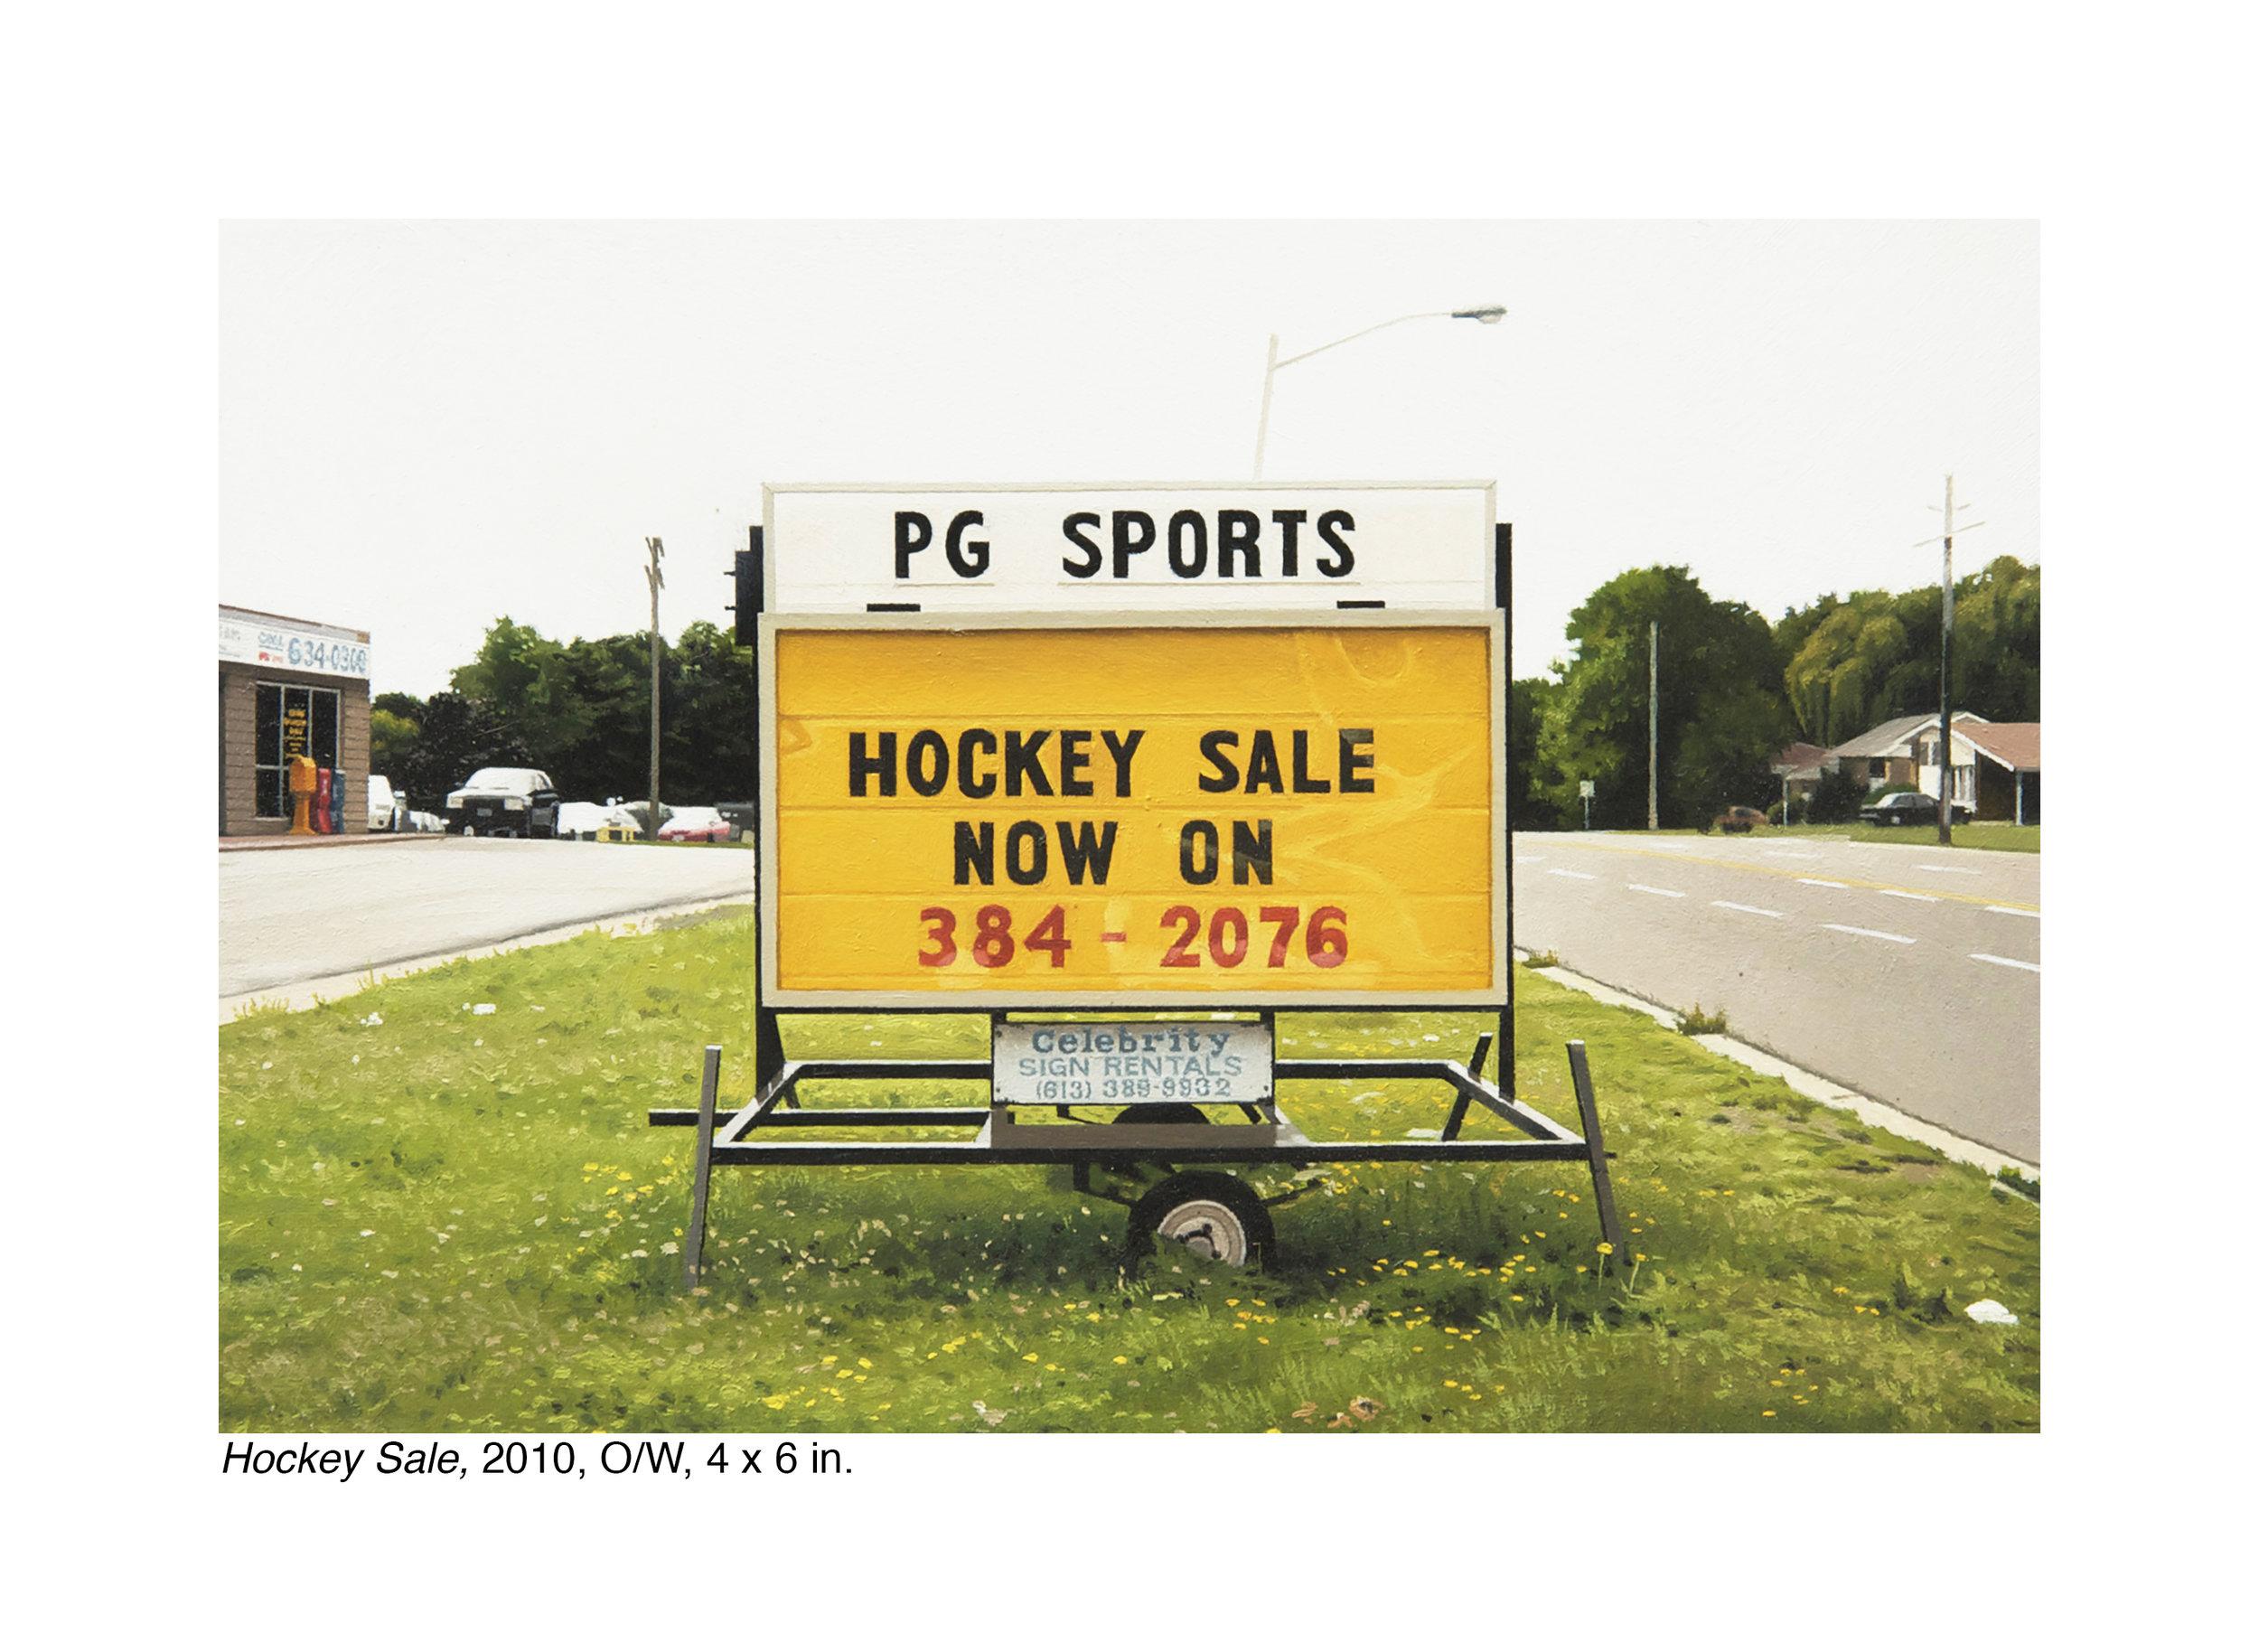 2010HockeySale.jpg